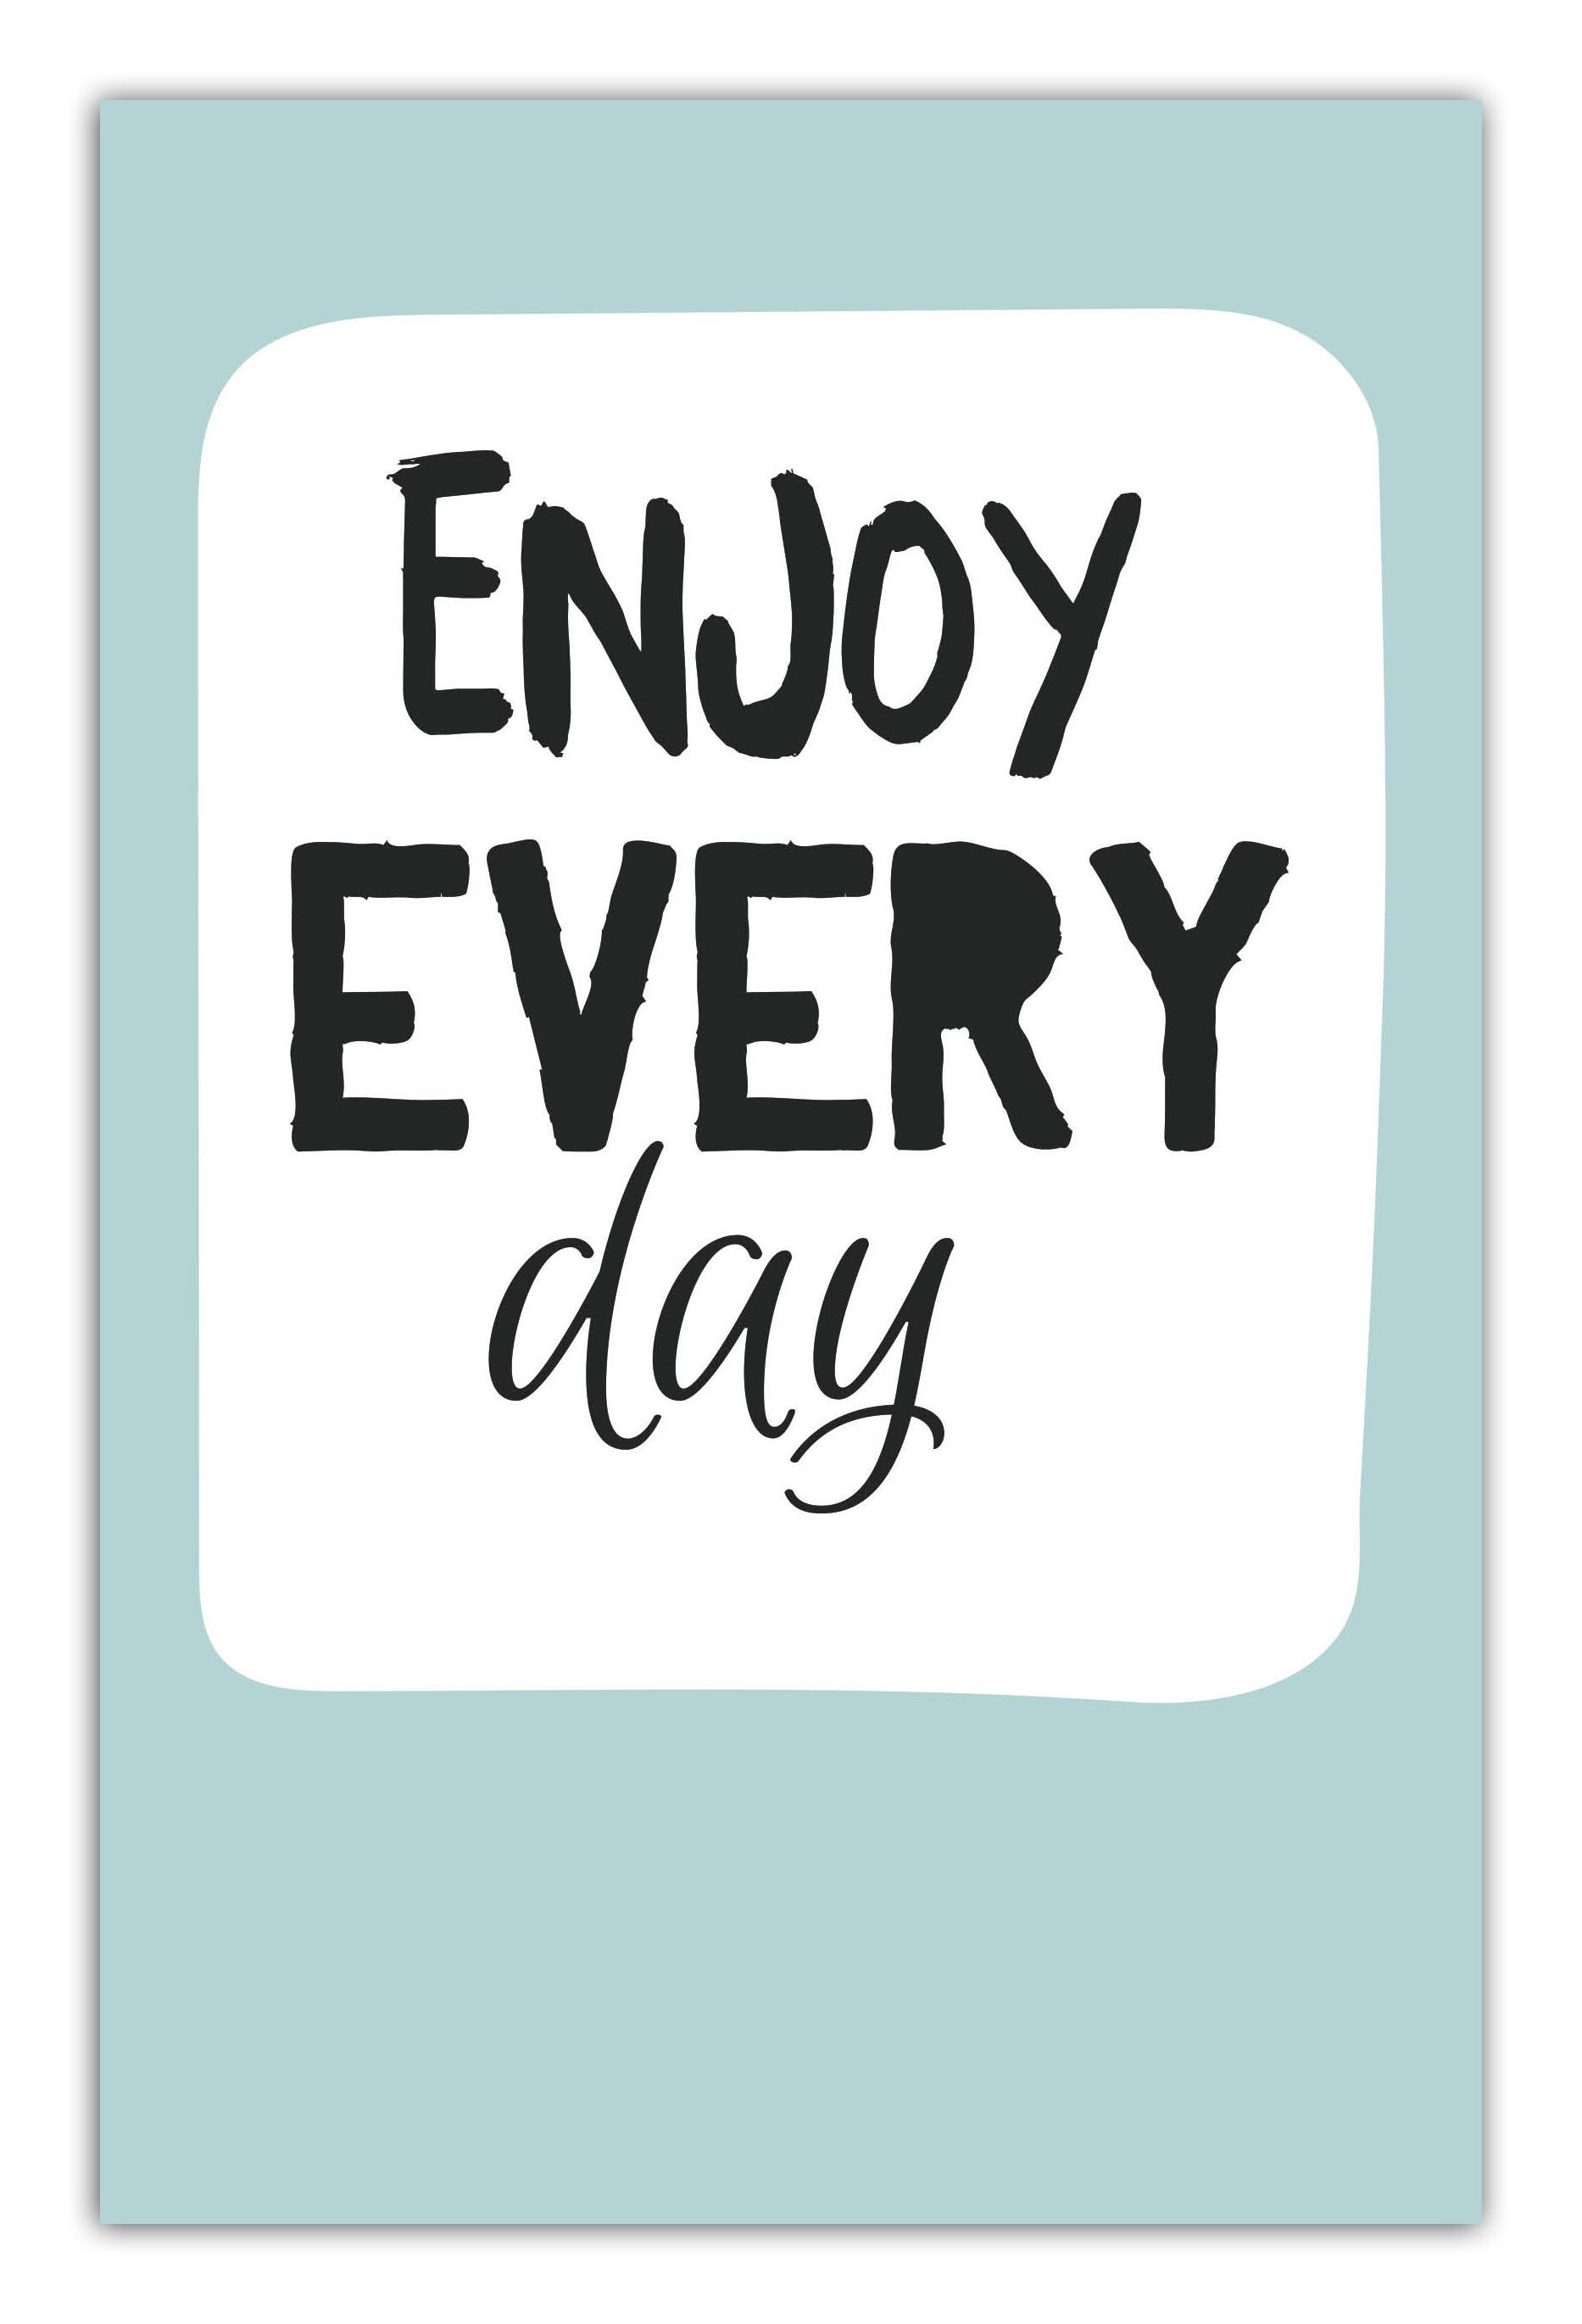 цена  Enjoy every day (light blue) (А5)  онлайн в 2017 году